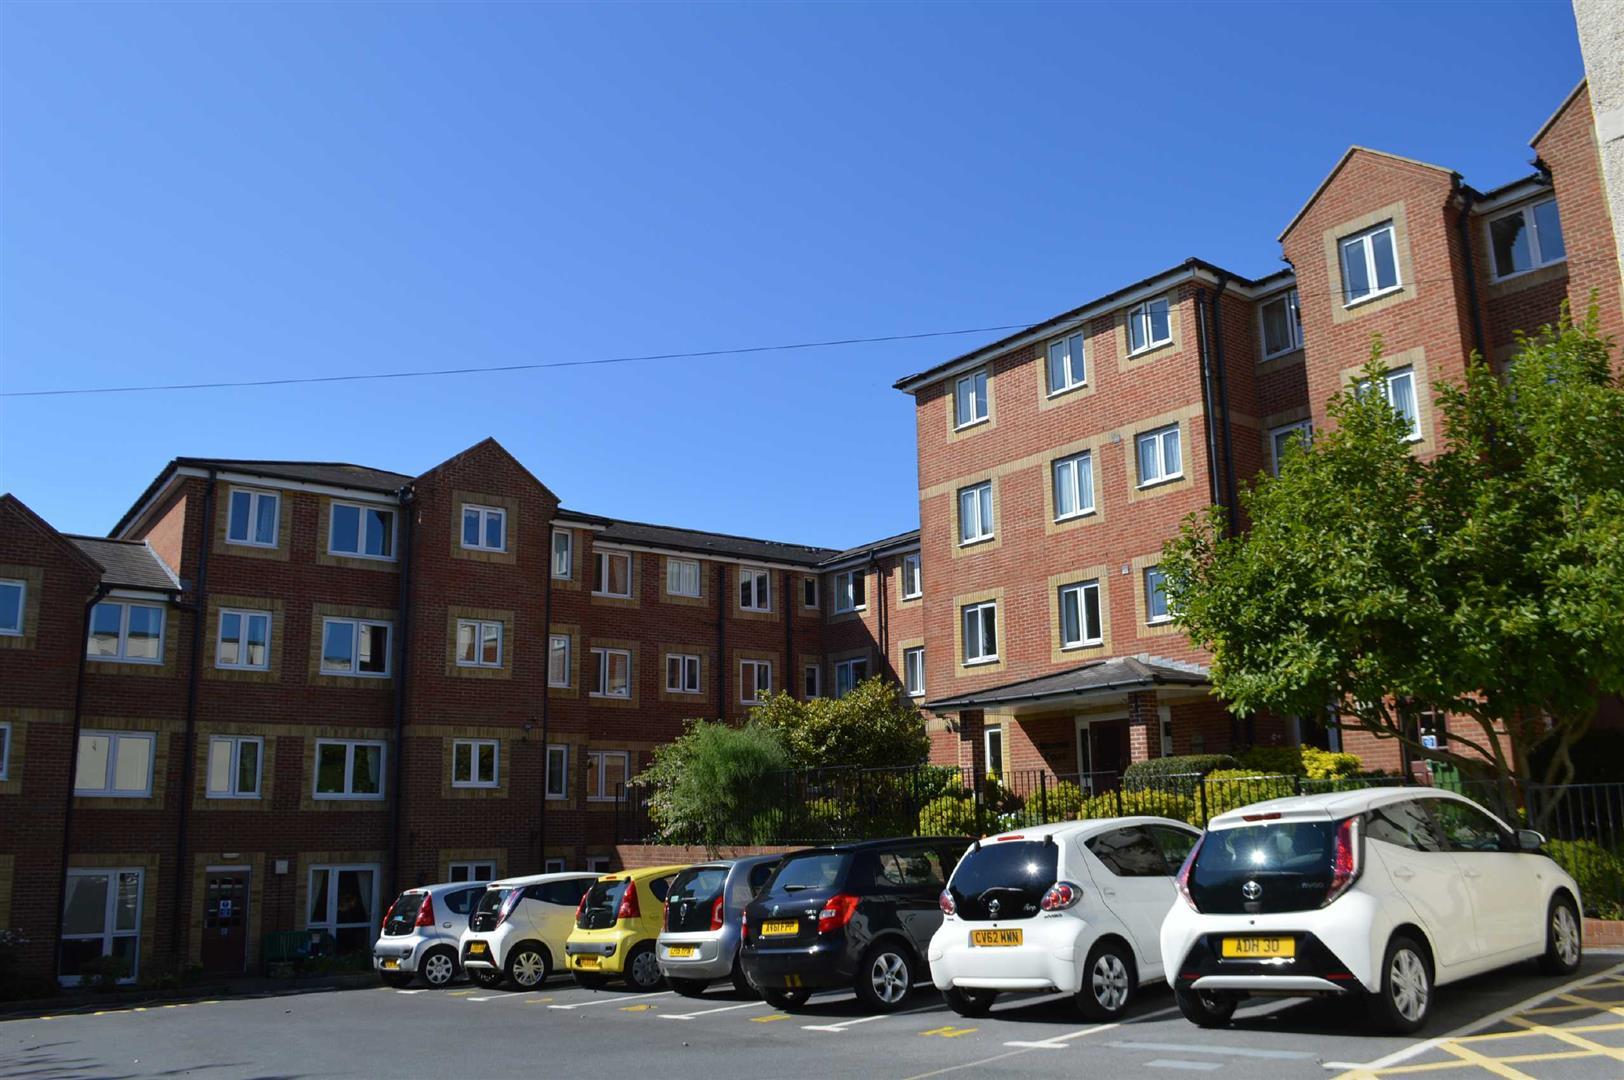 Maxime Court, Sketty, Swansea, SA2 9FB